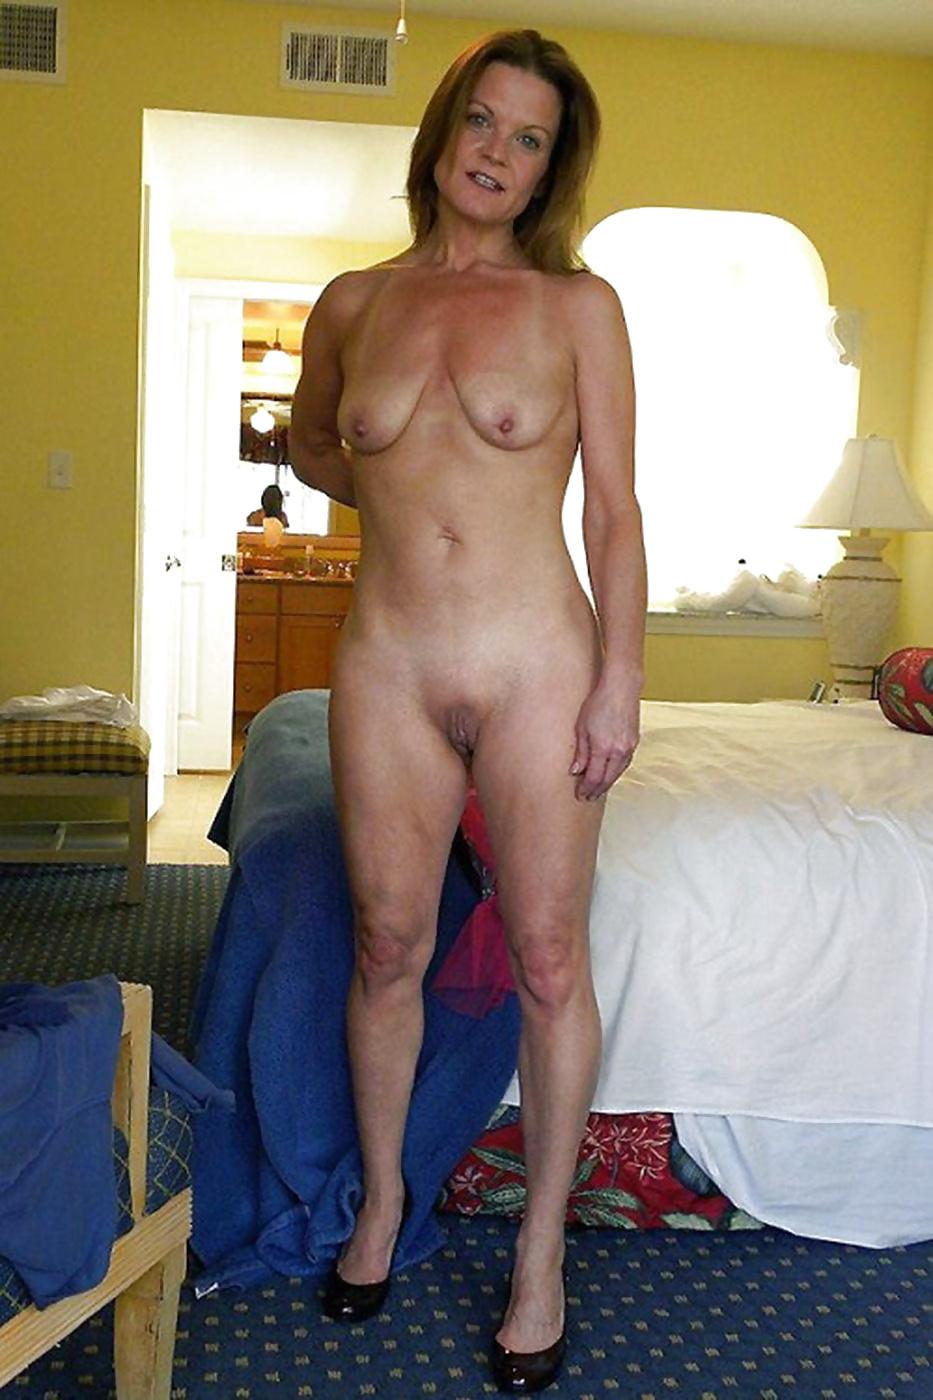 Redneck porn amateur post normal women steele fucked